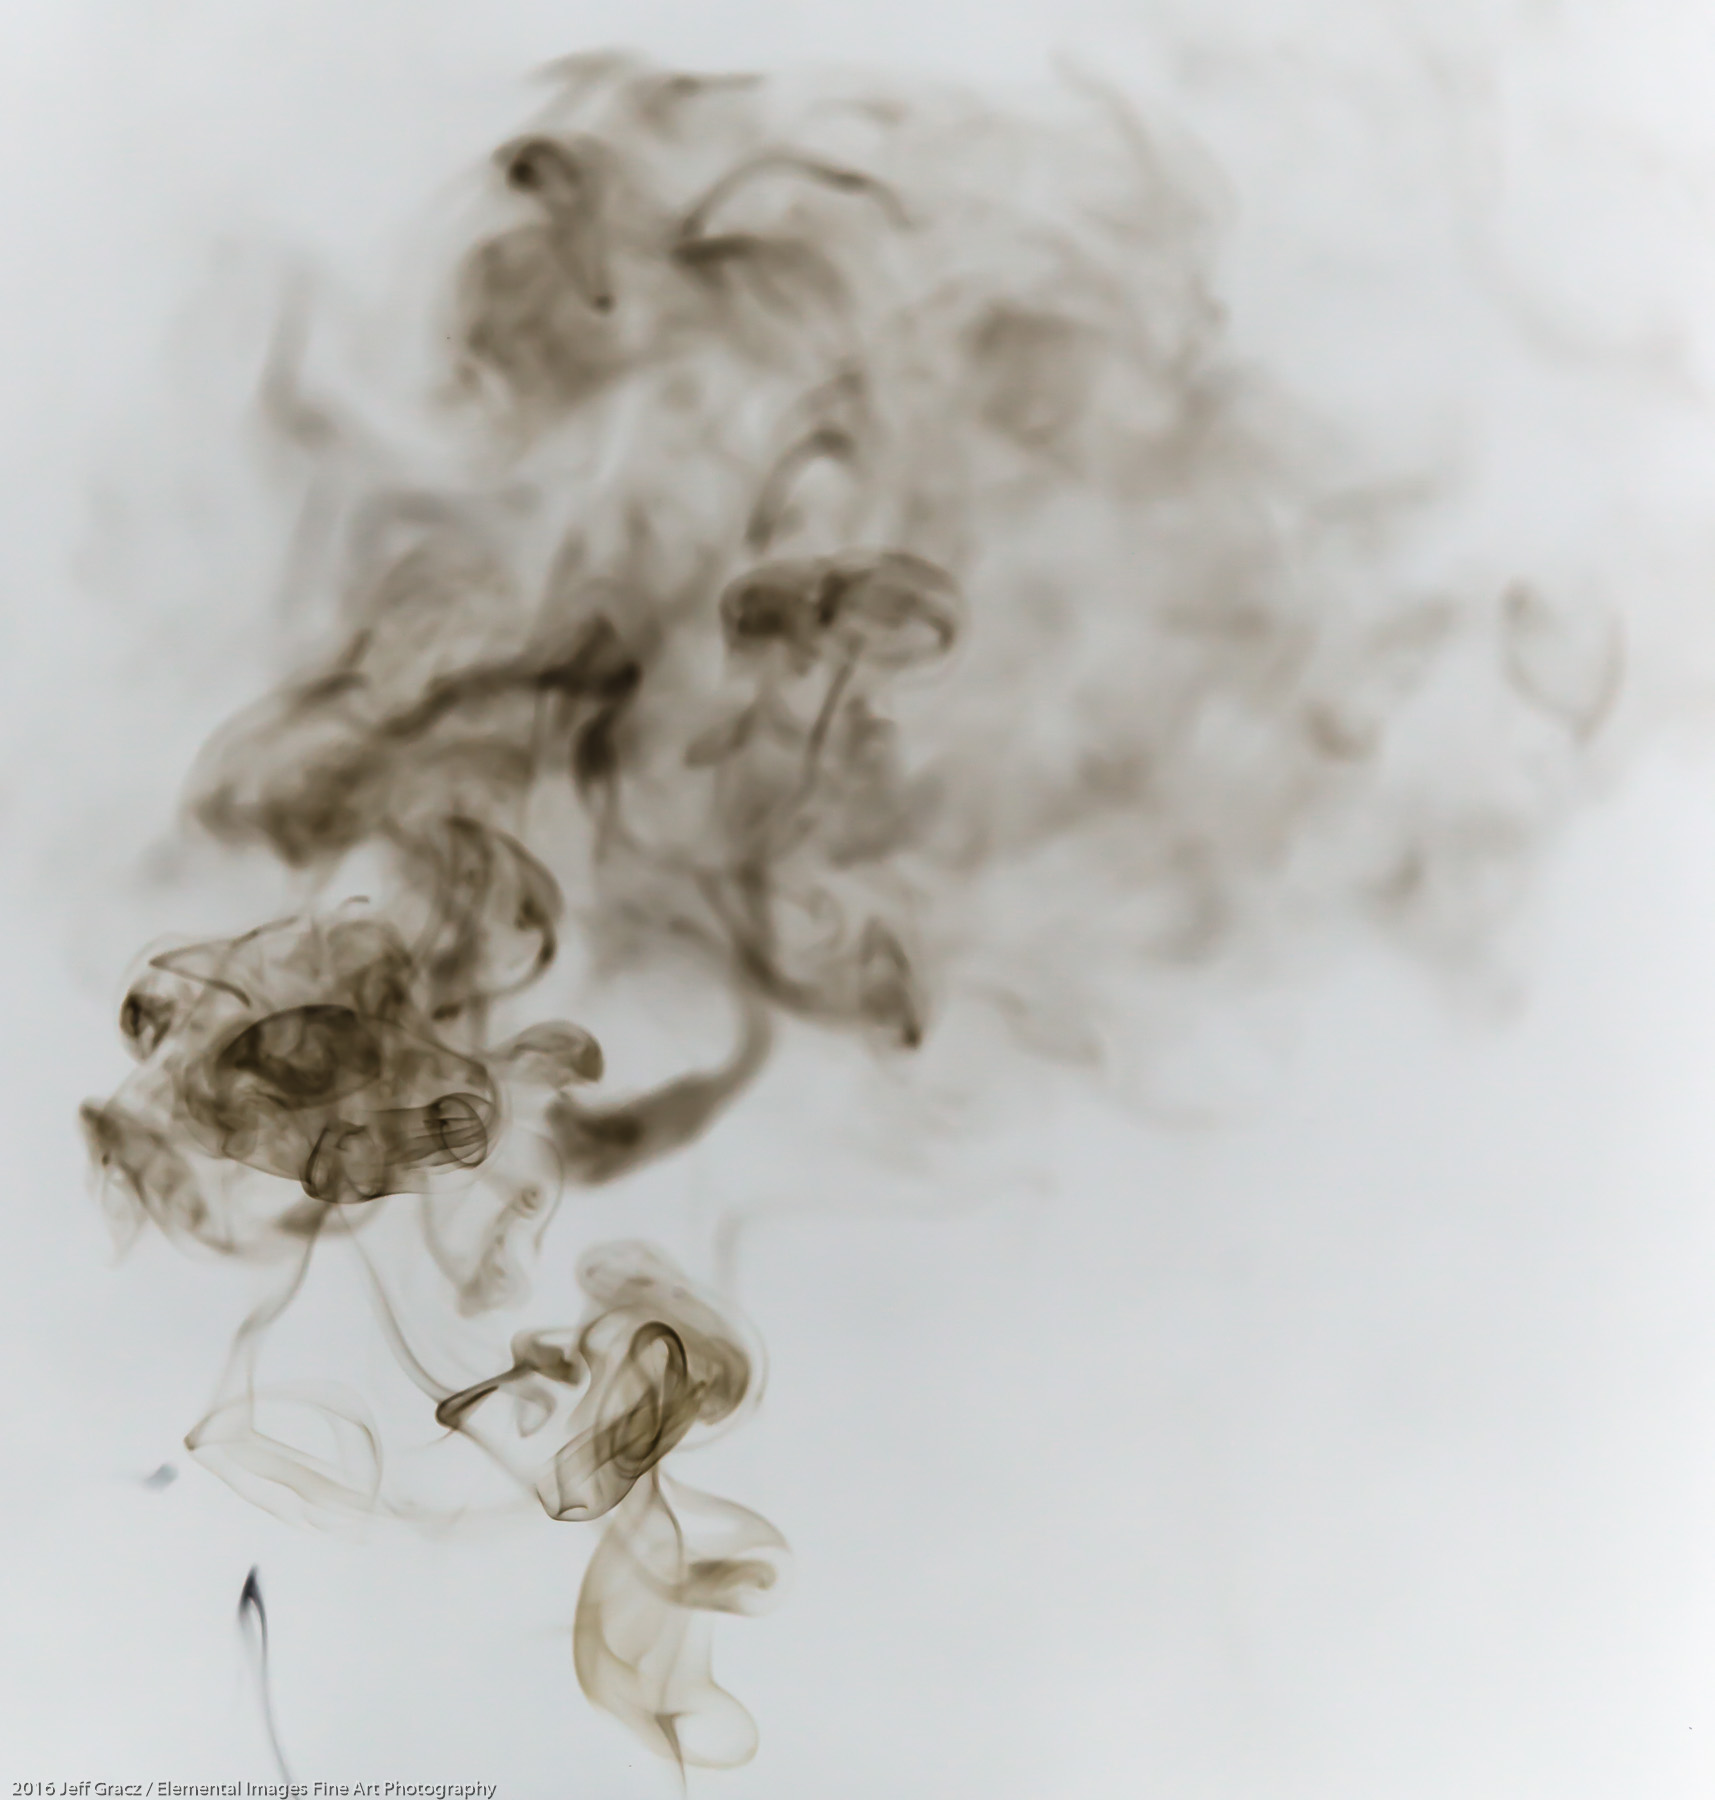 Smoke 7 | Vancouver | WA | USA - © 2016 Jeff Gracz / Elemental Images Fine Art Photography - All Rights Reserved Worldwide